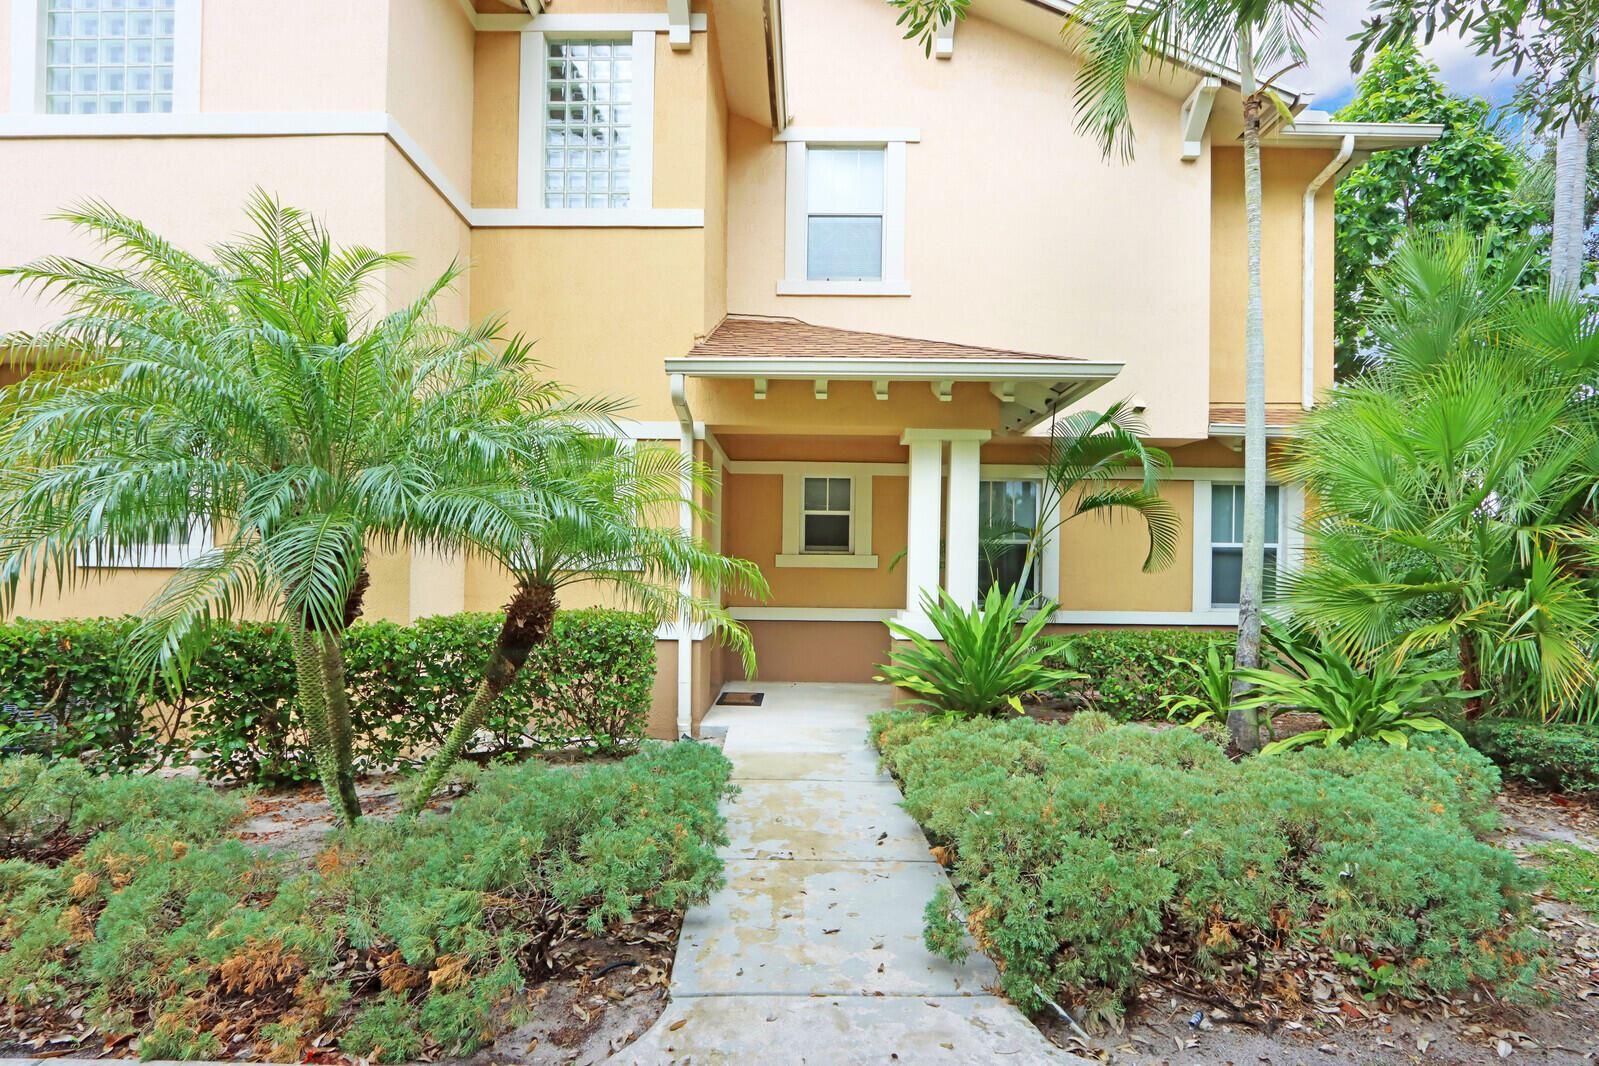 880 Millbrae Court #1, West Palm Beach, FL 33401 - #: RX-10752432